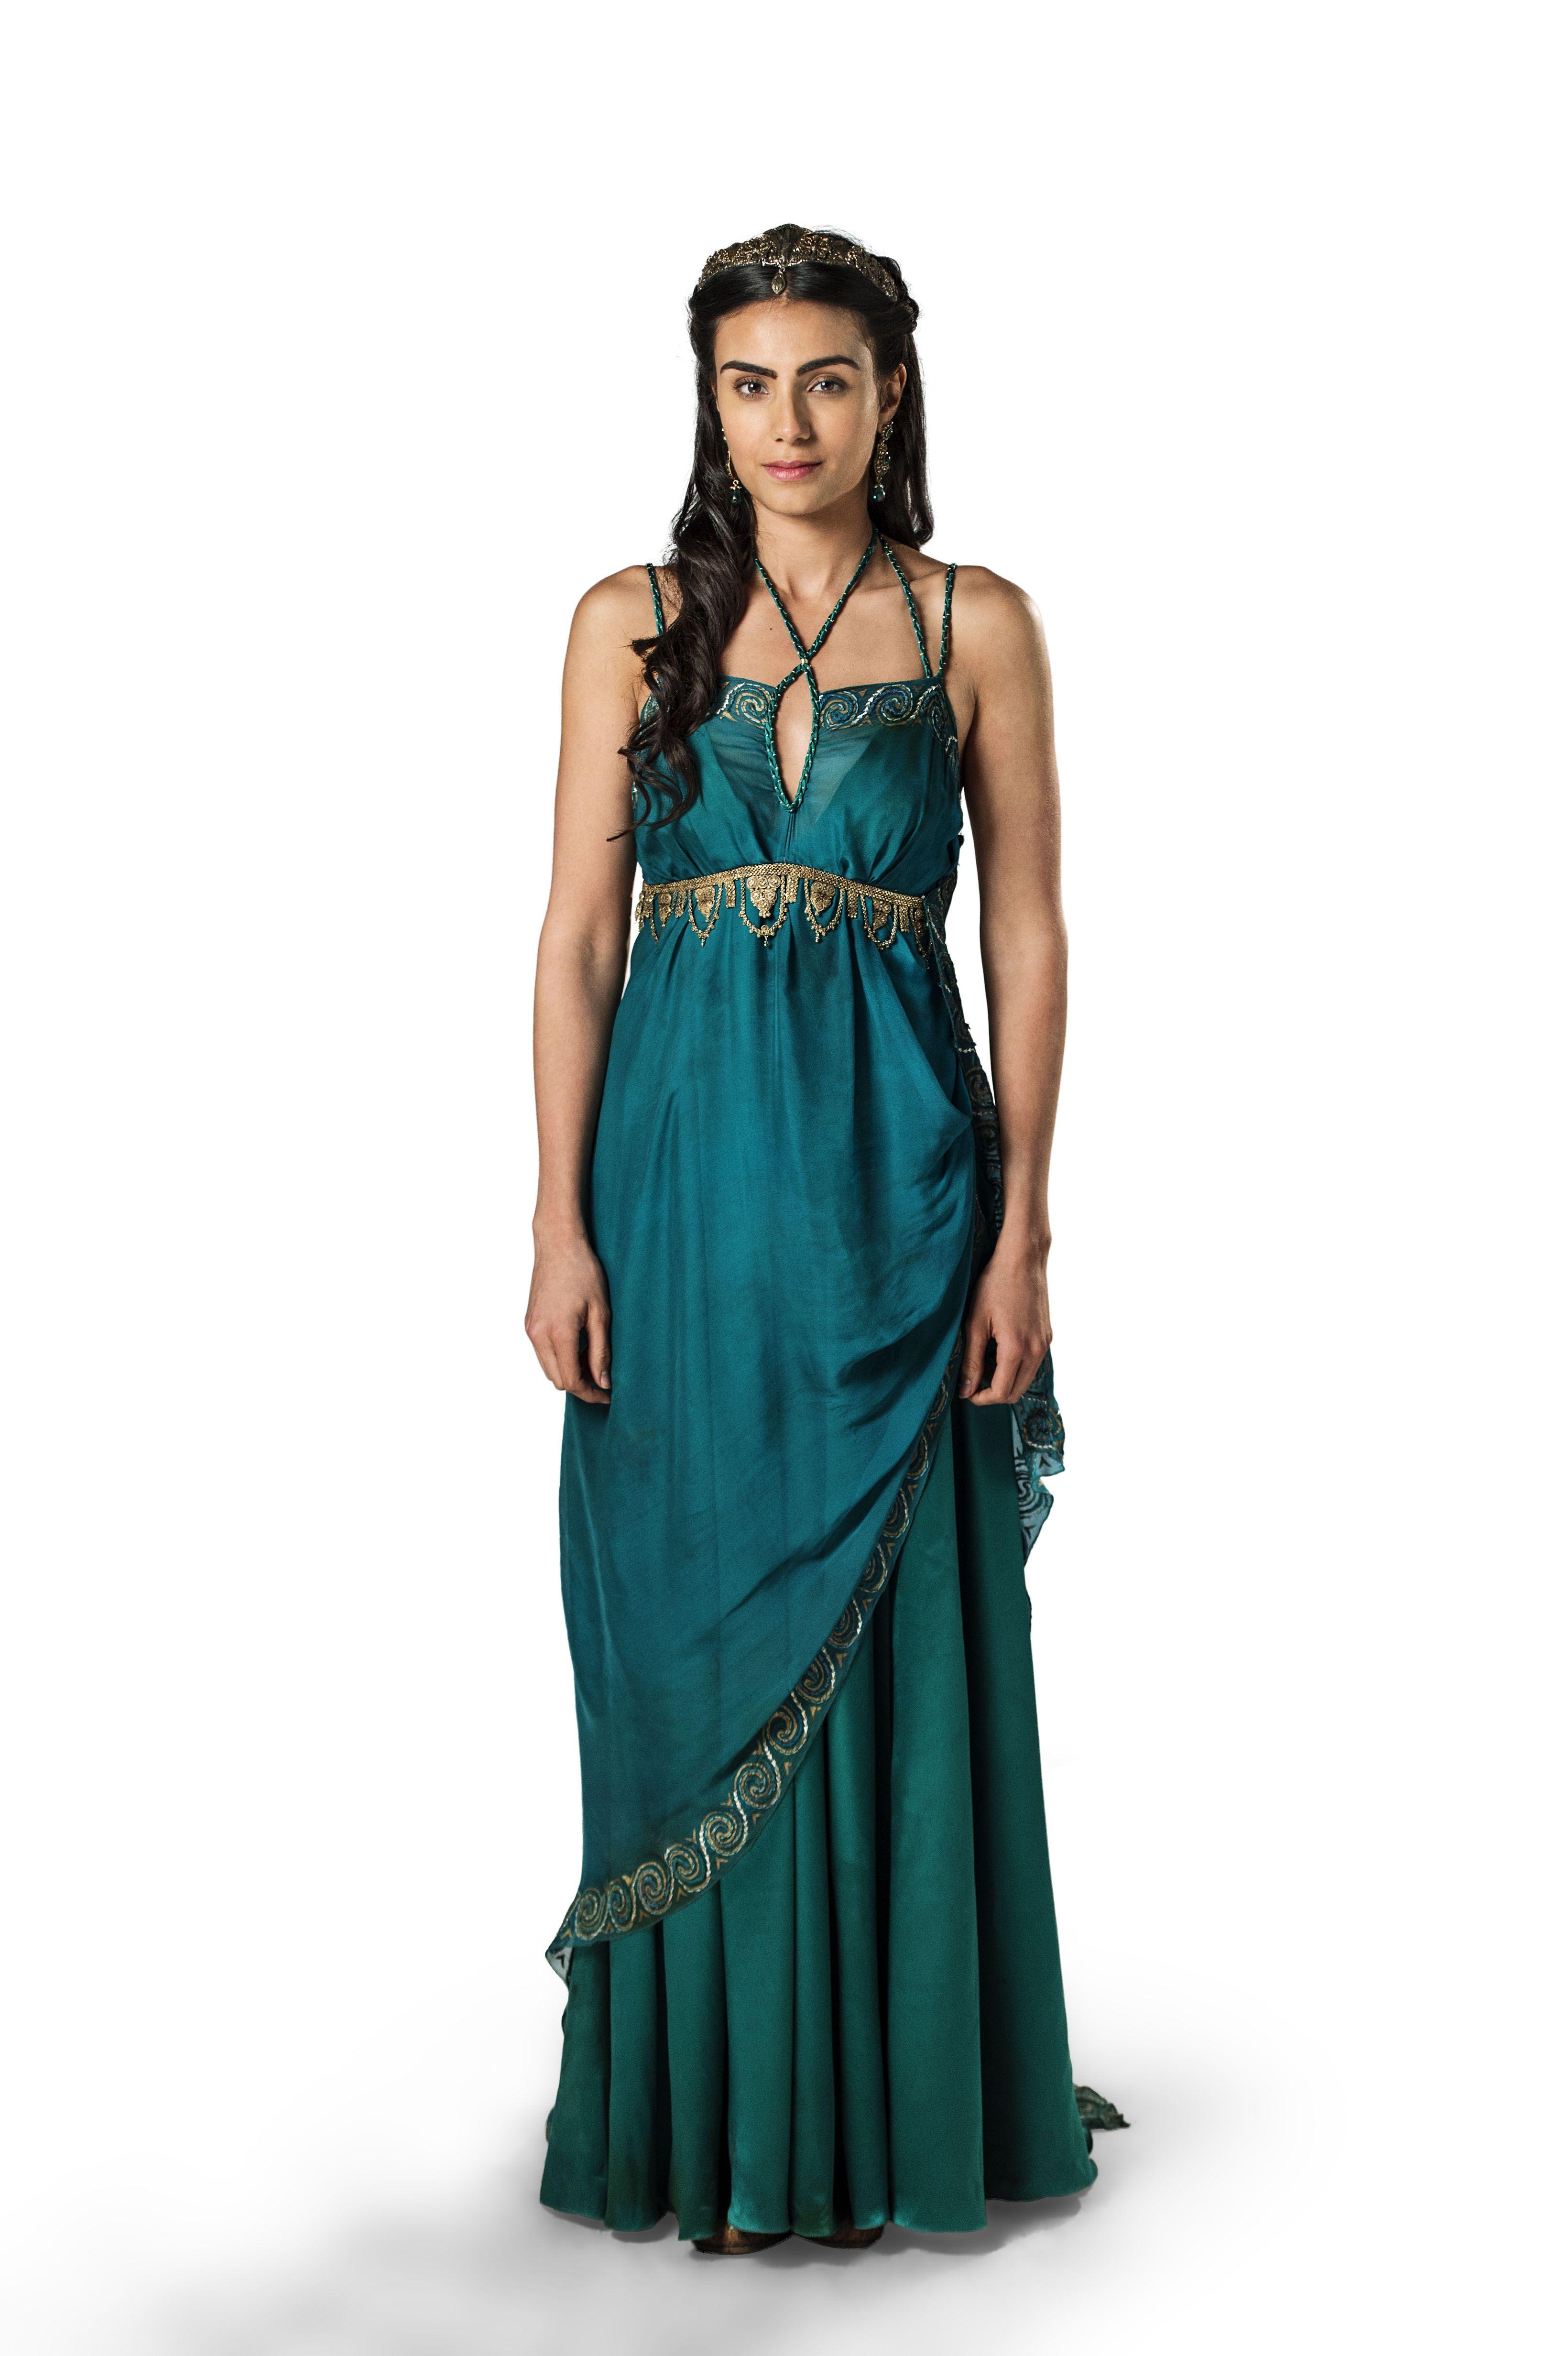 Atlantis - Season 2 Promo - her Dresses so Beautiful ...